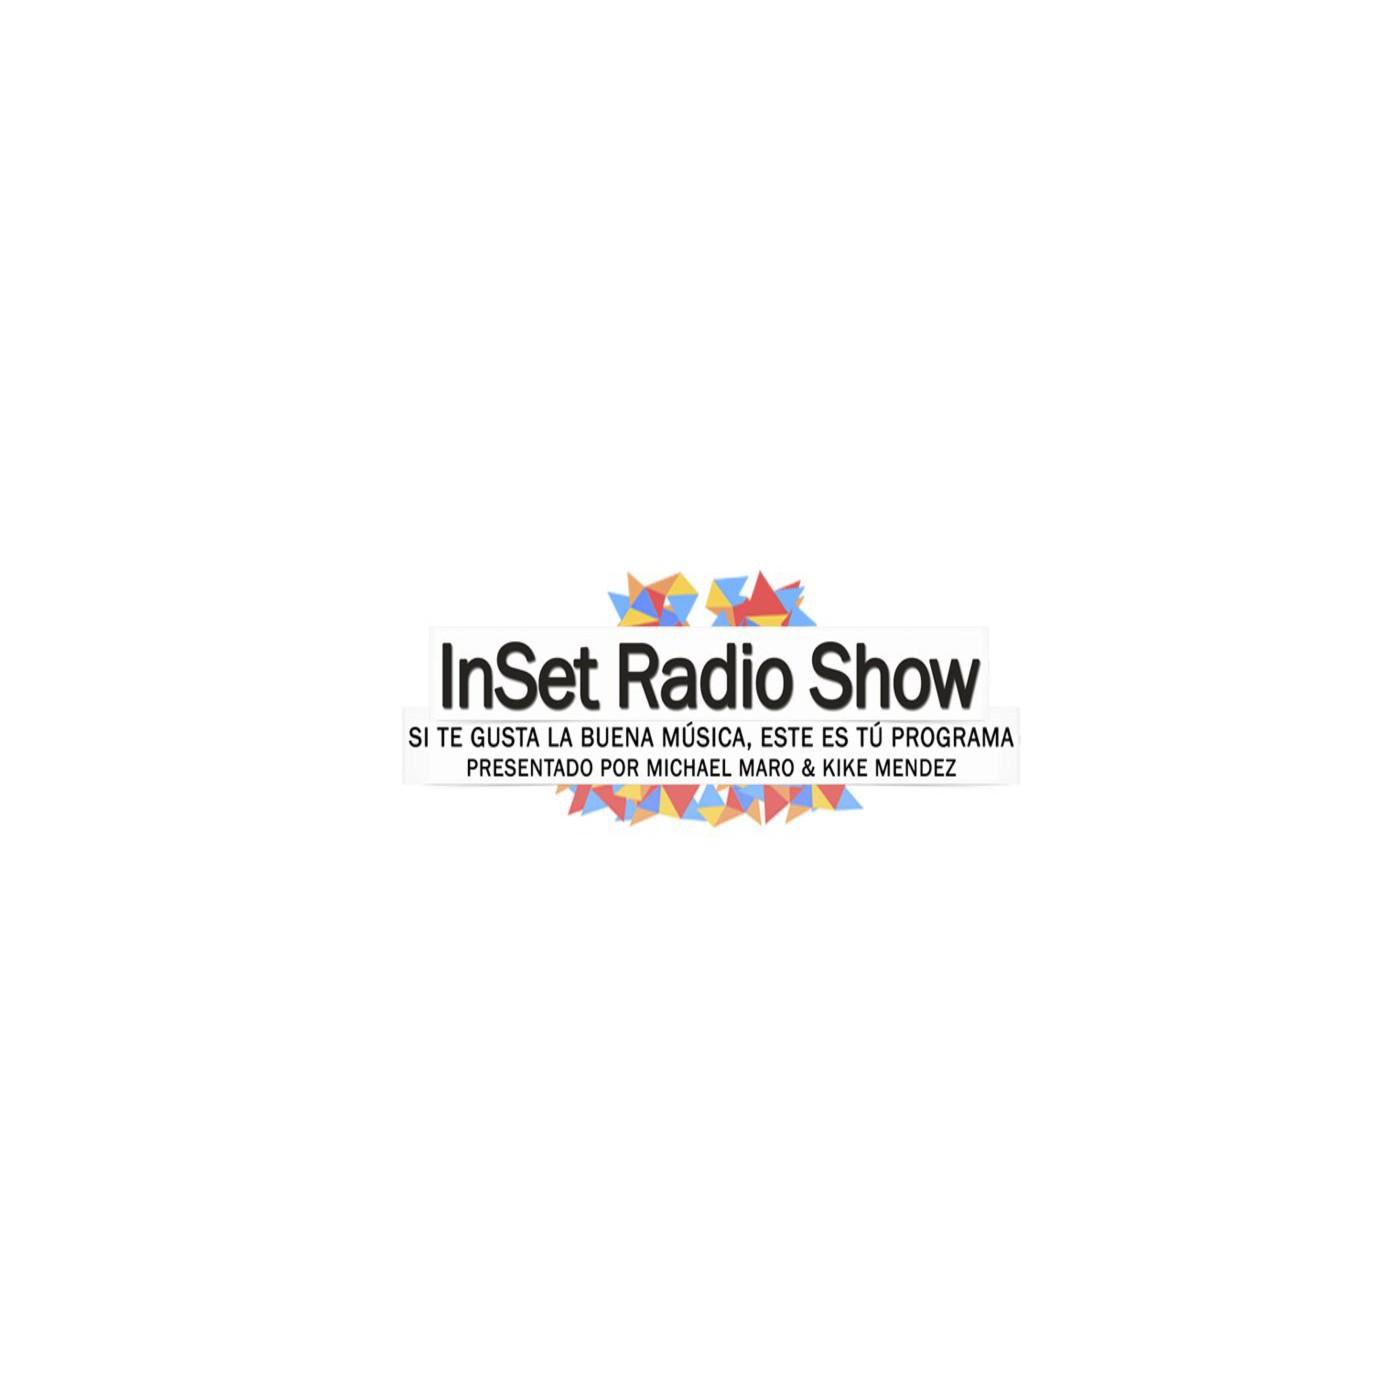 <![CDATA[InSet Radio Show ]]>